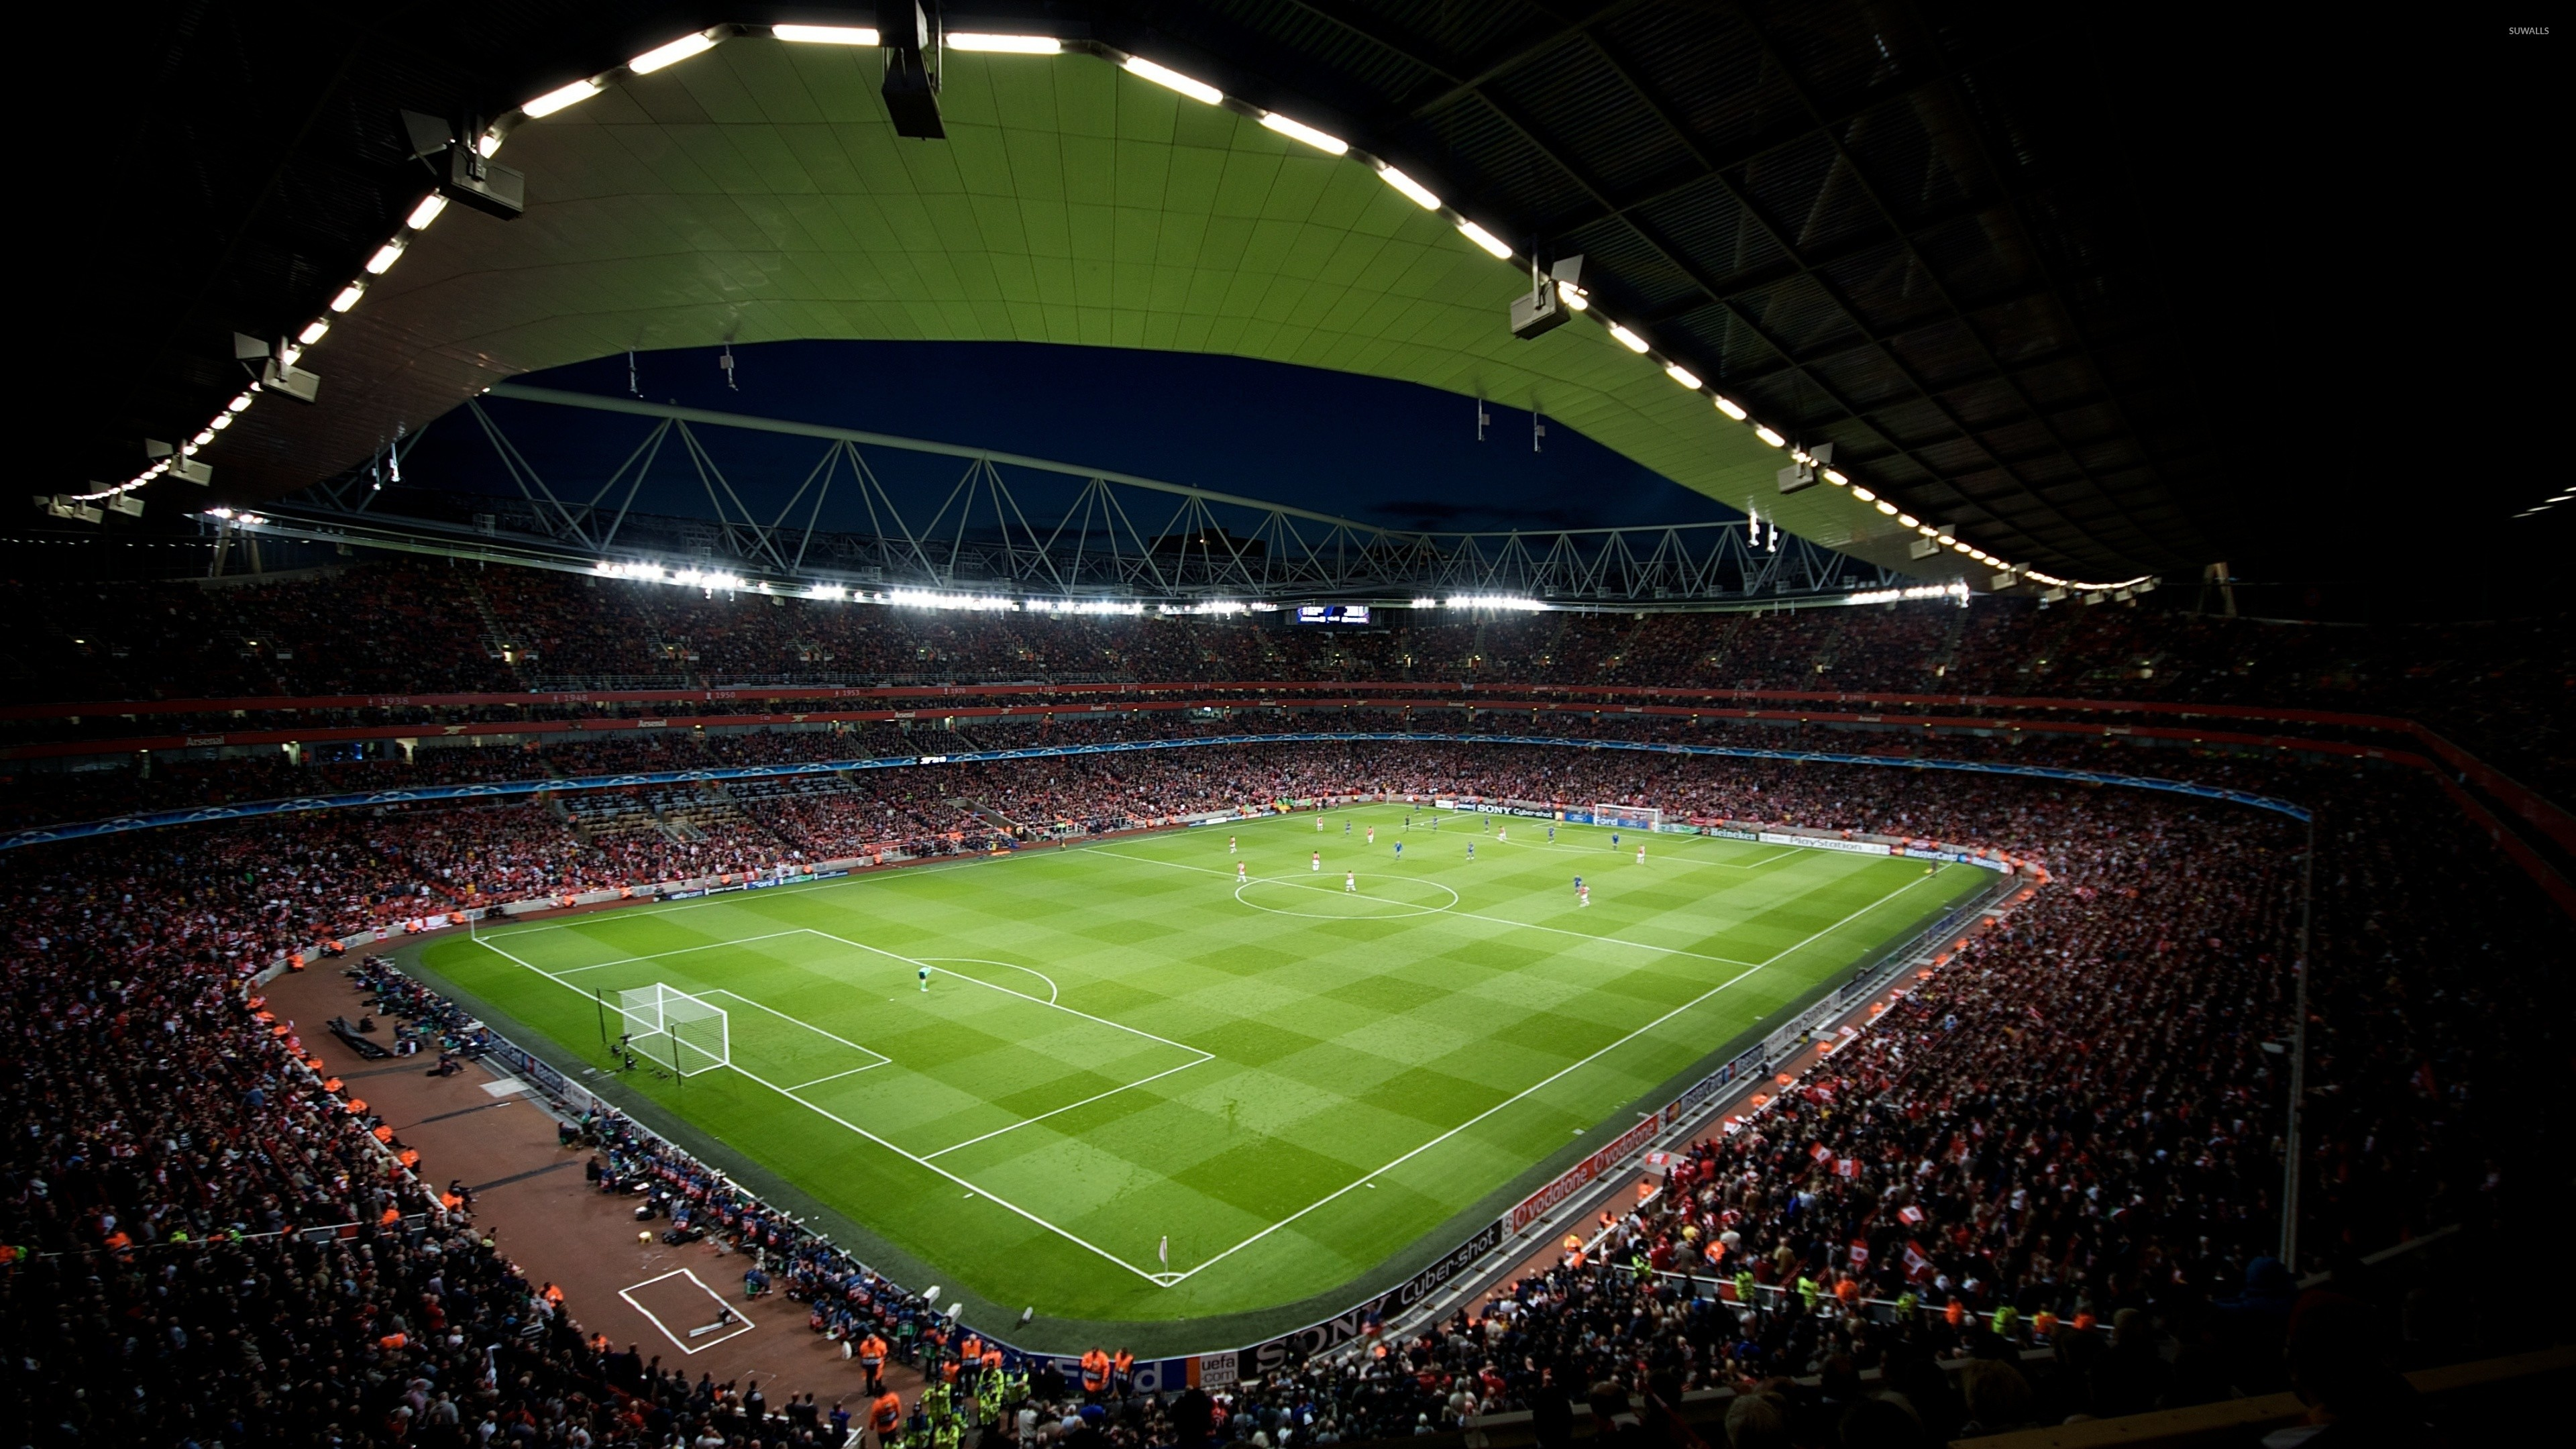 Res: 3840x2160, Football stadium wallpaper